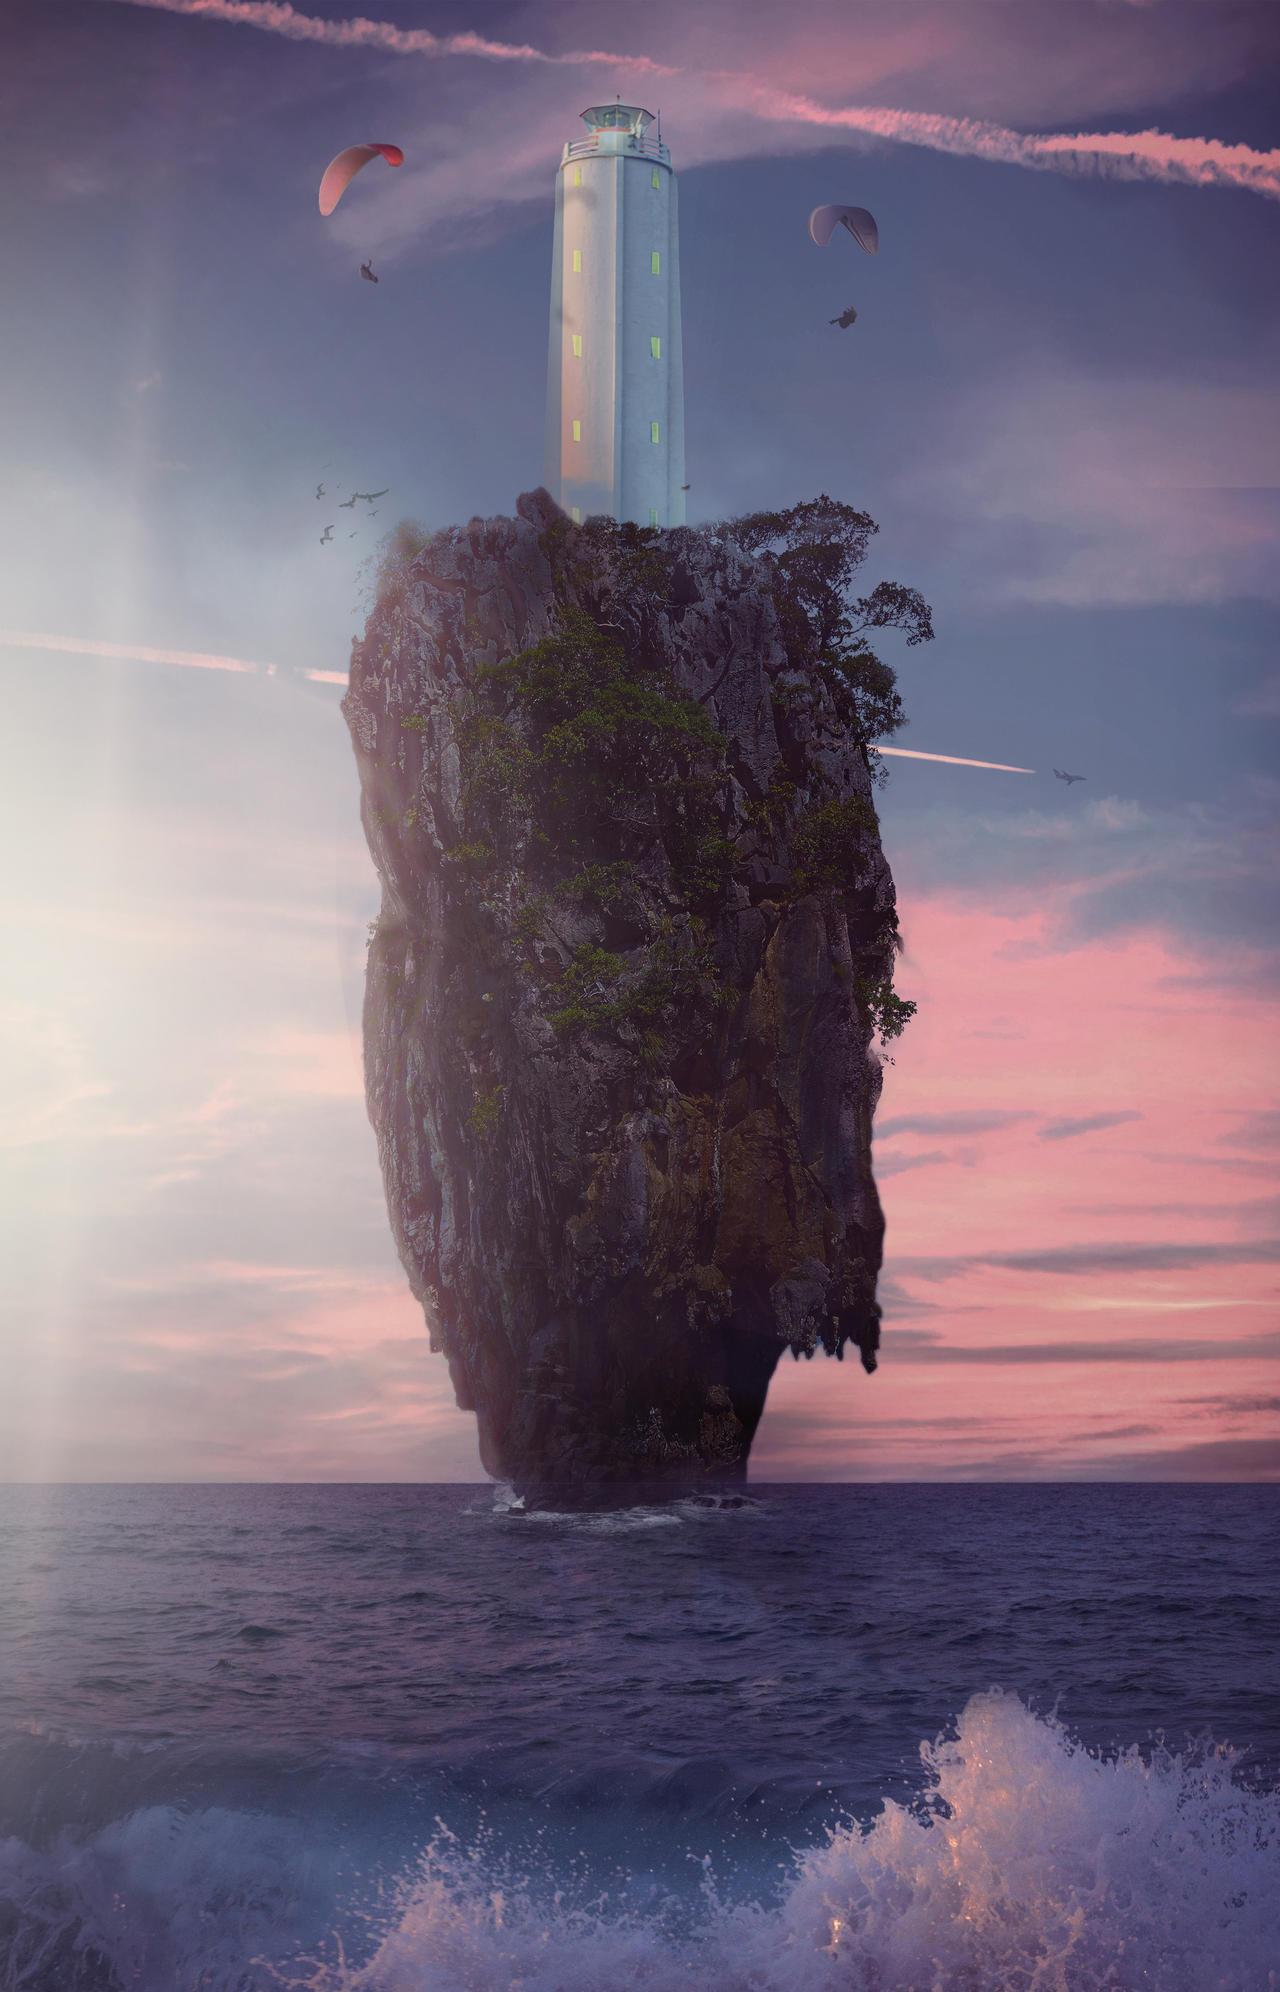 Amidst the lighthouse